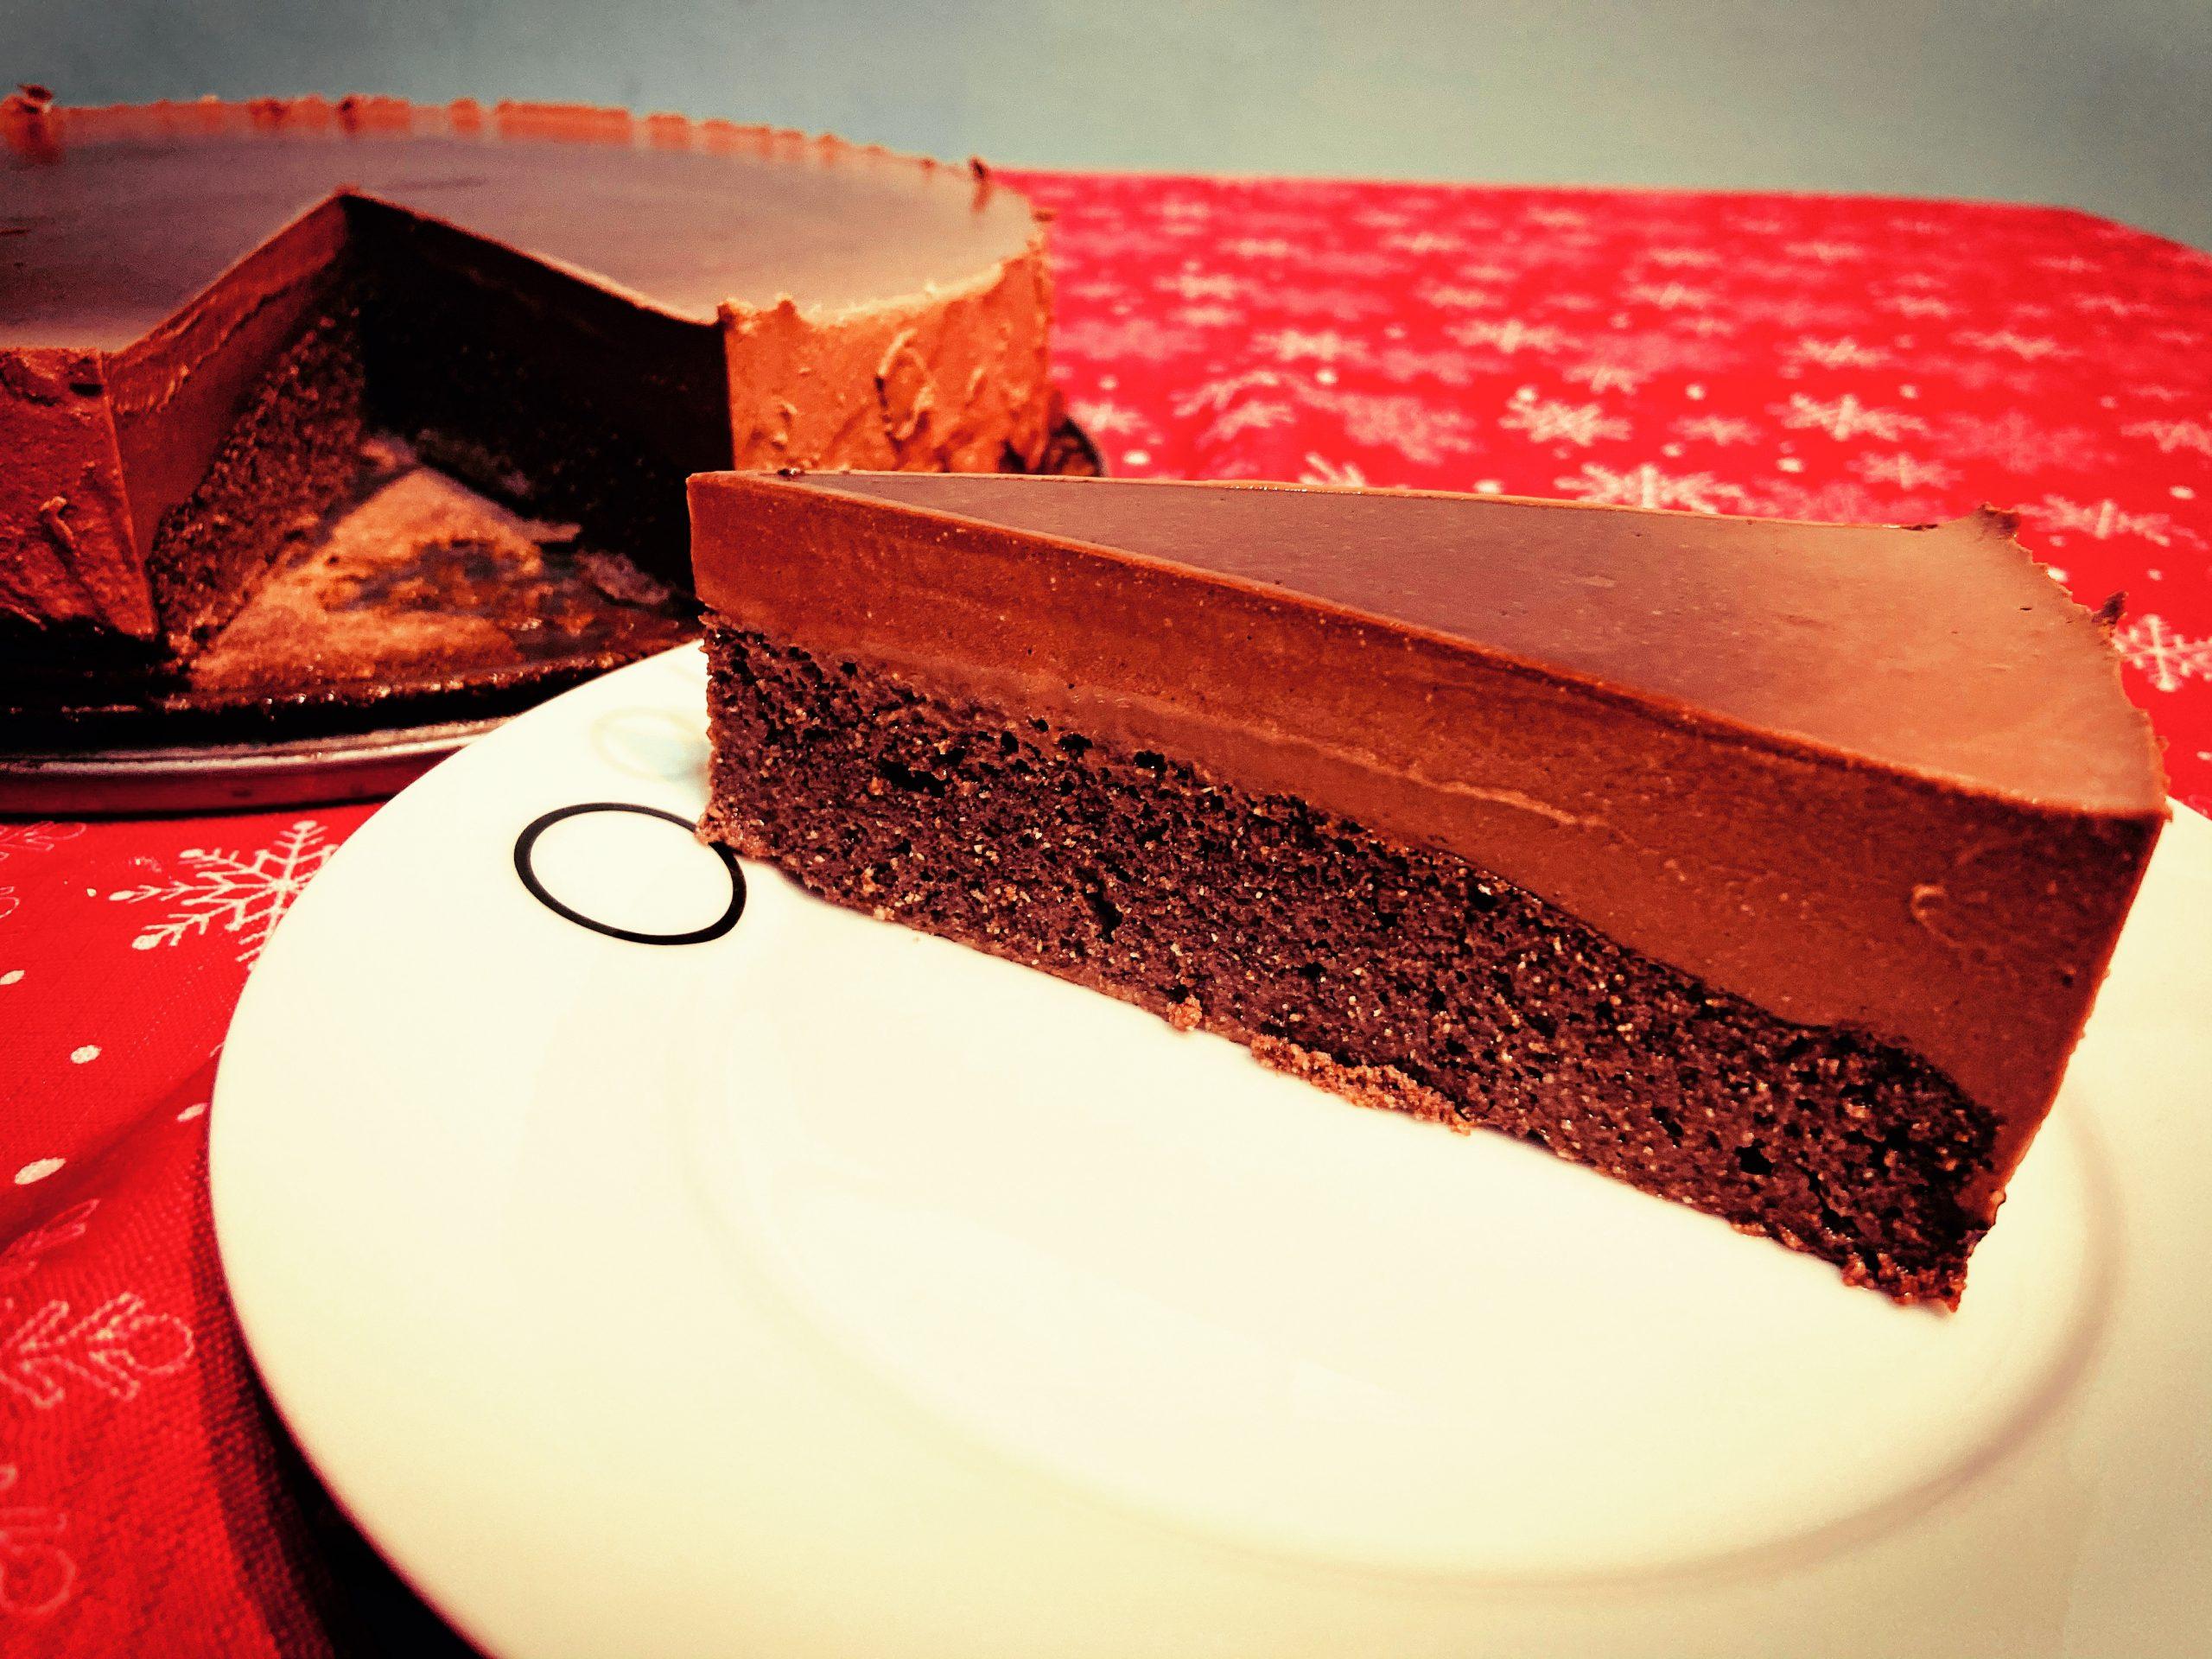 KETO DECEMBER CAKE